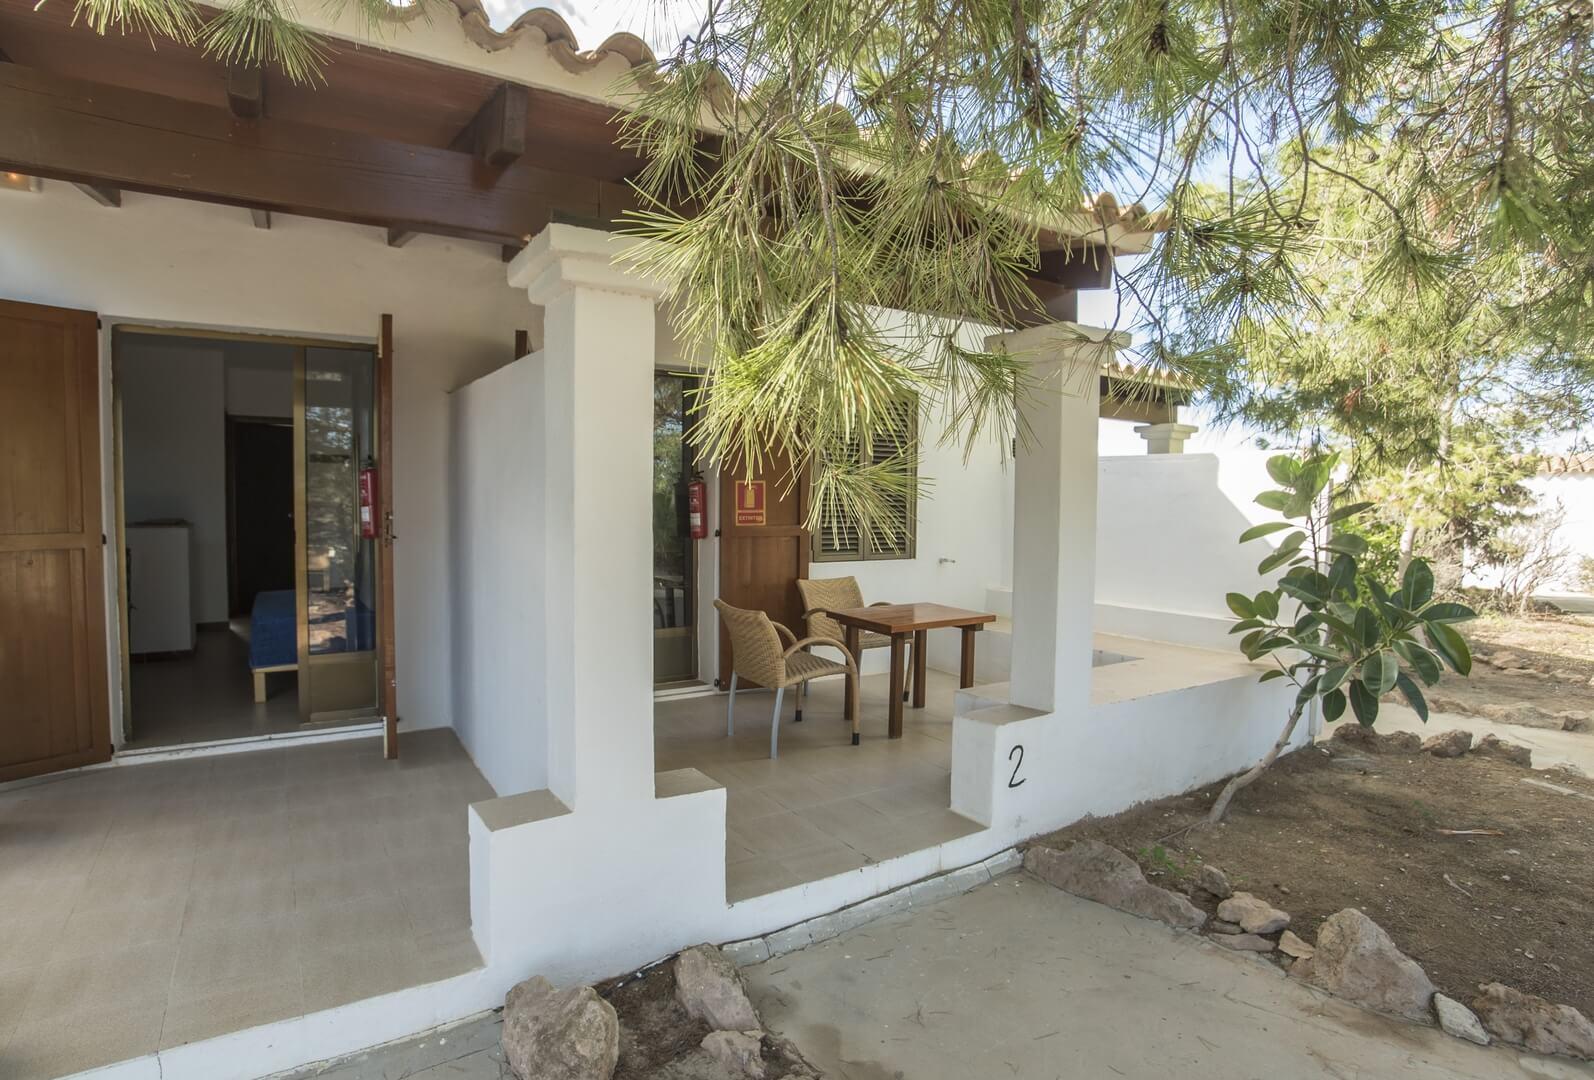 Apartamento Alquiler Formentera. Casa Eugenio, Es Brolls